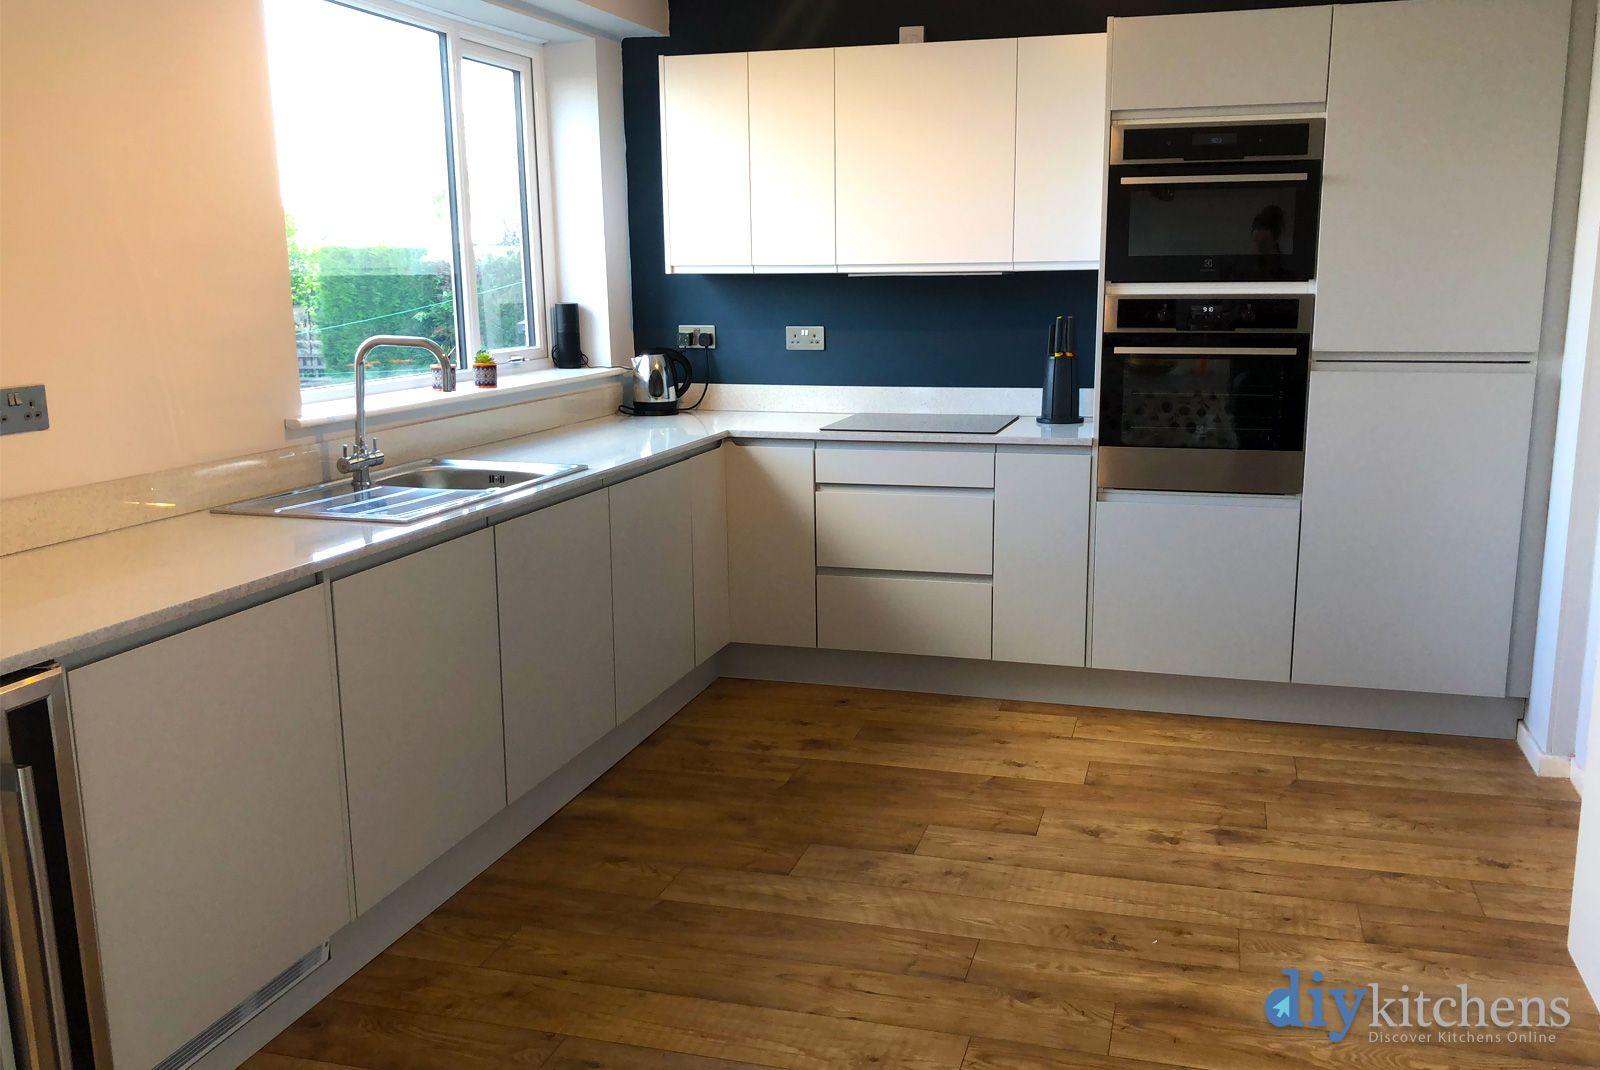 Best An Innova Luca Dove Grey Handleless Kitchen In 2019 400 x 300